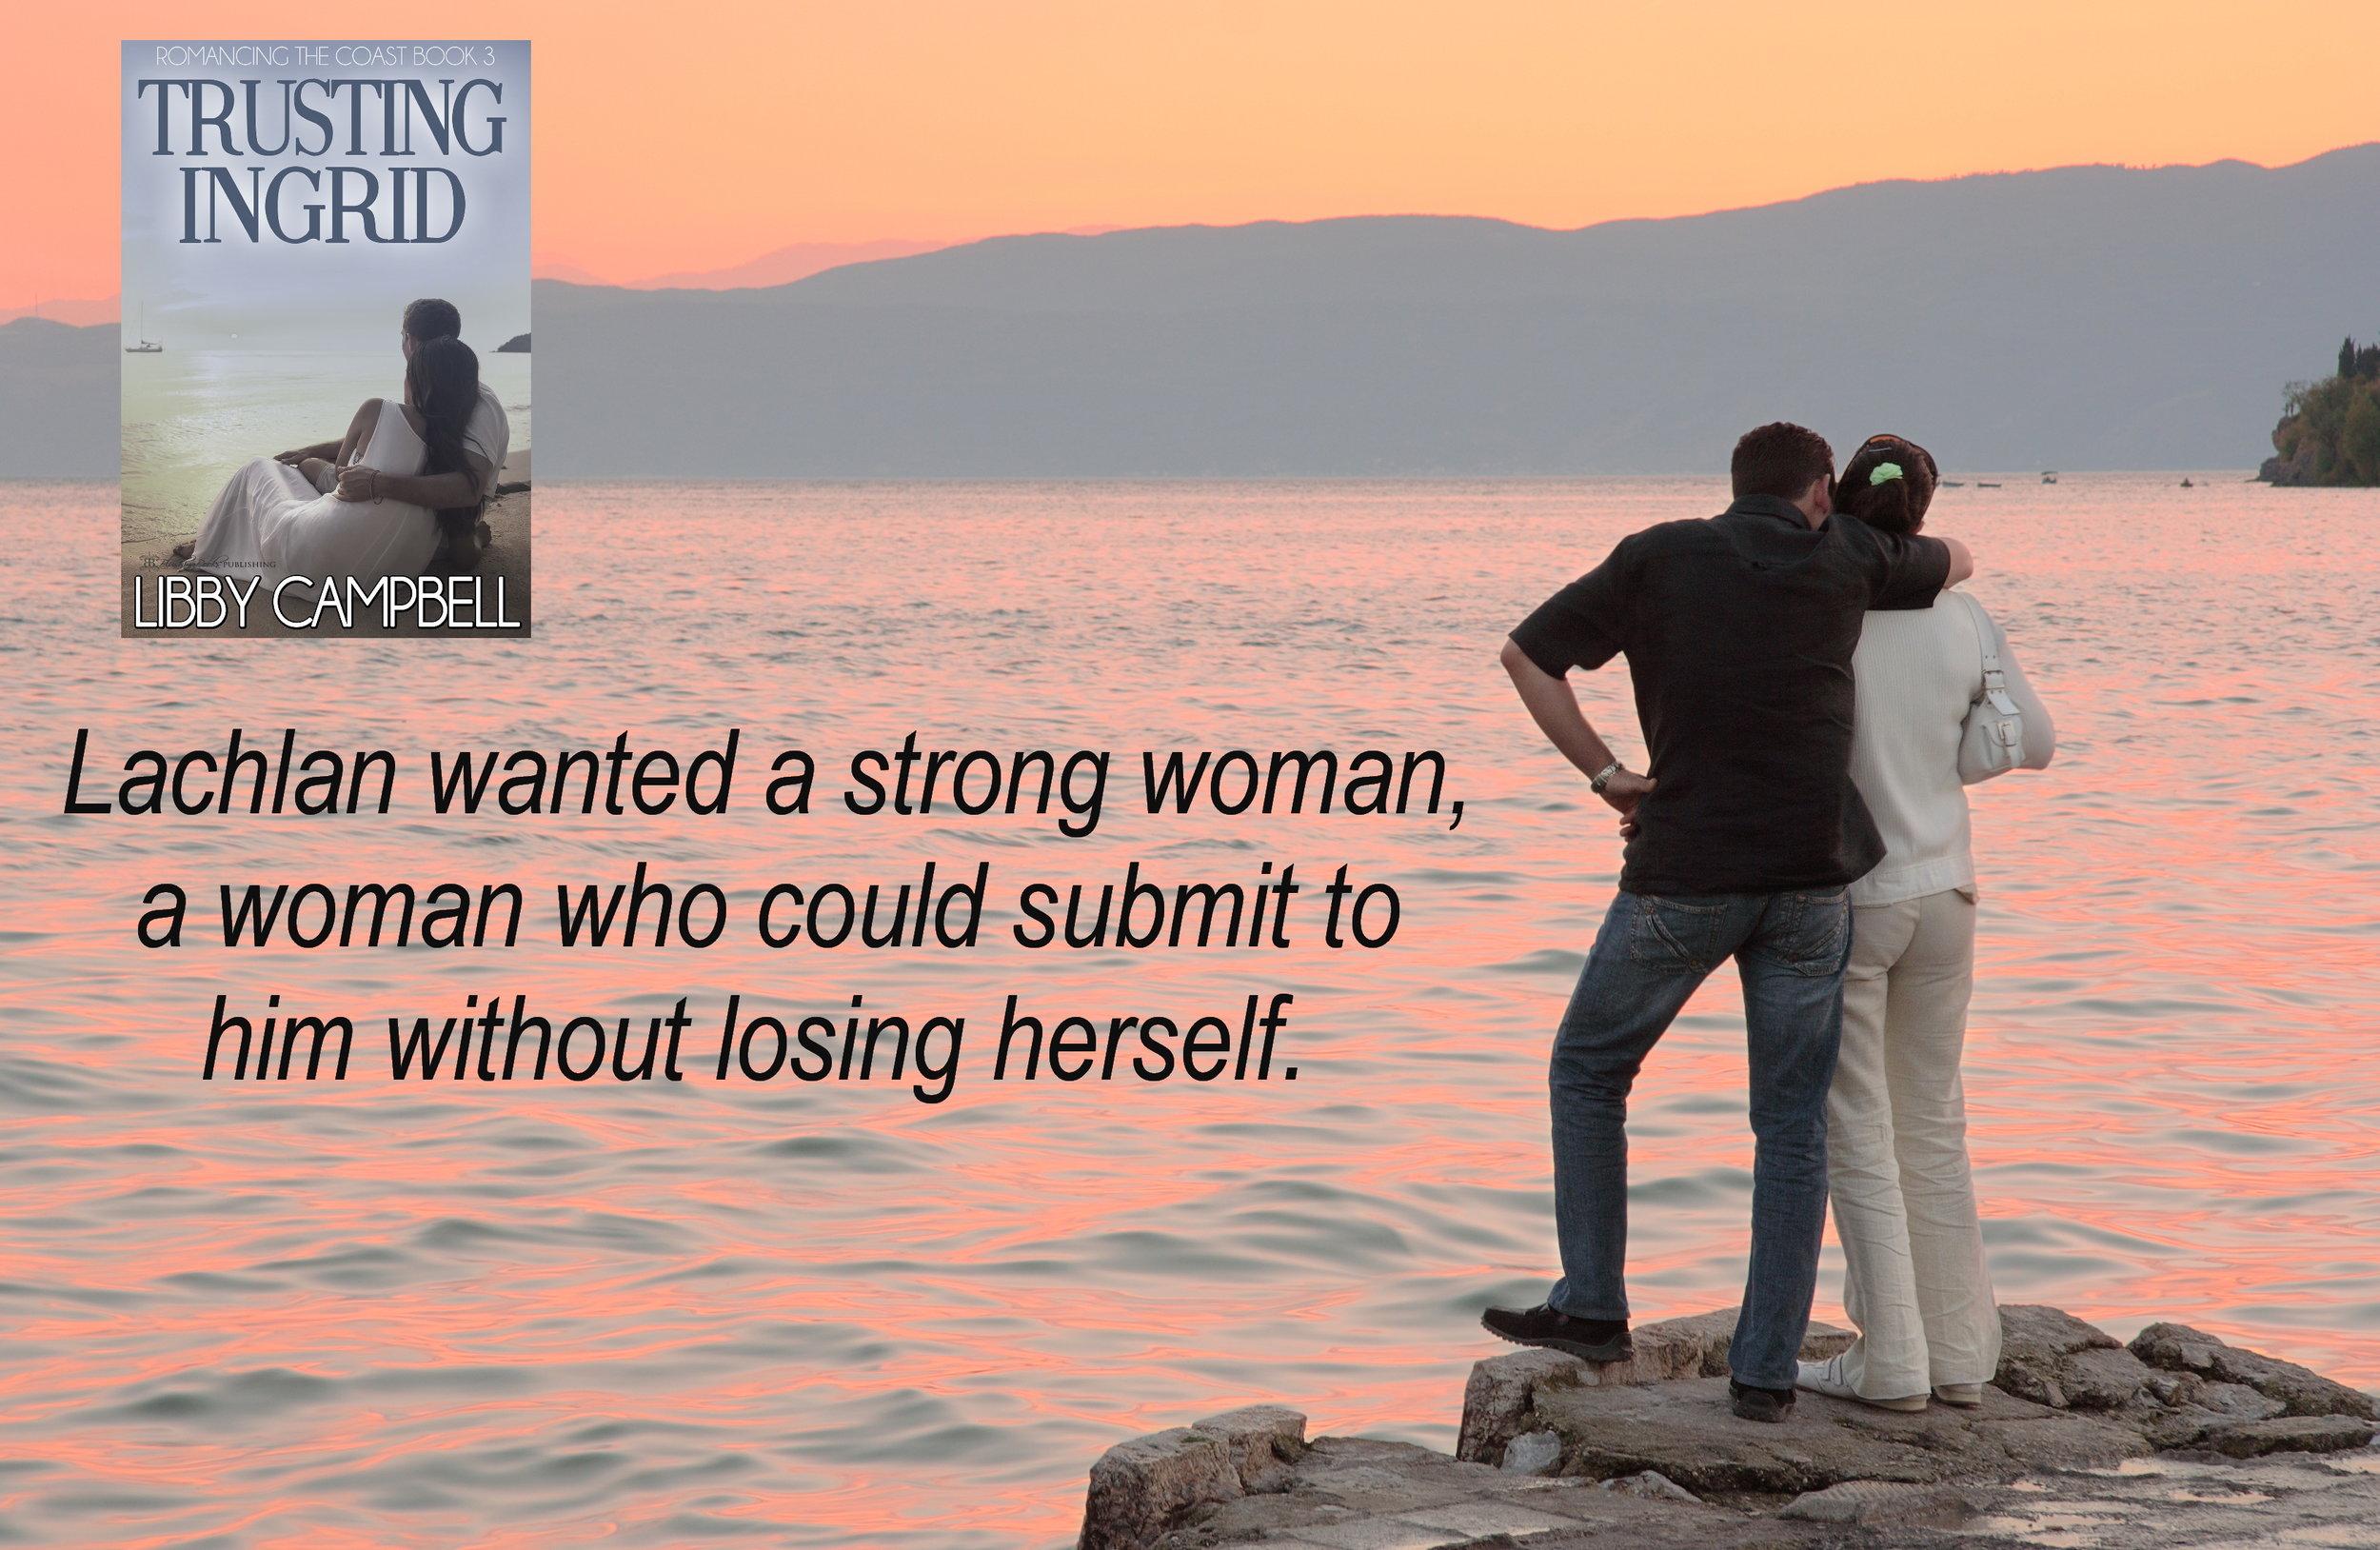 Trusting Ingrid Promo 1.jpg